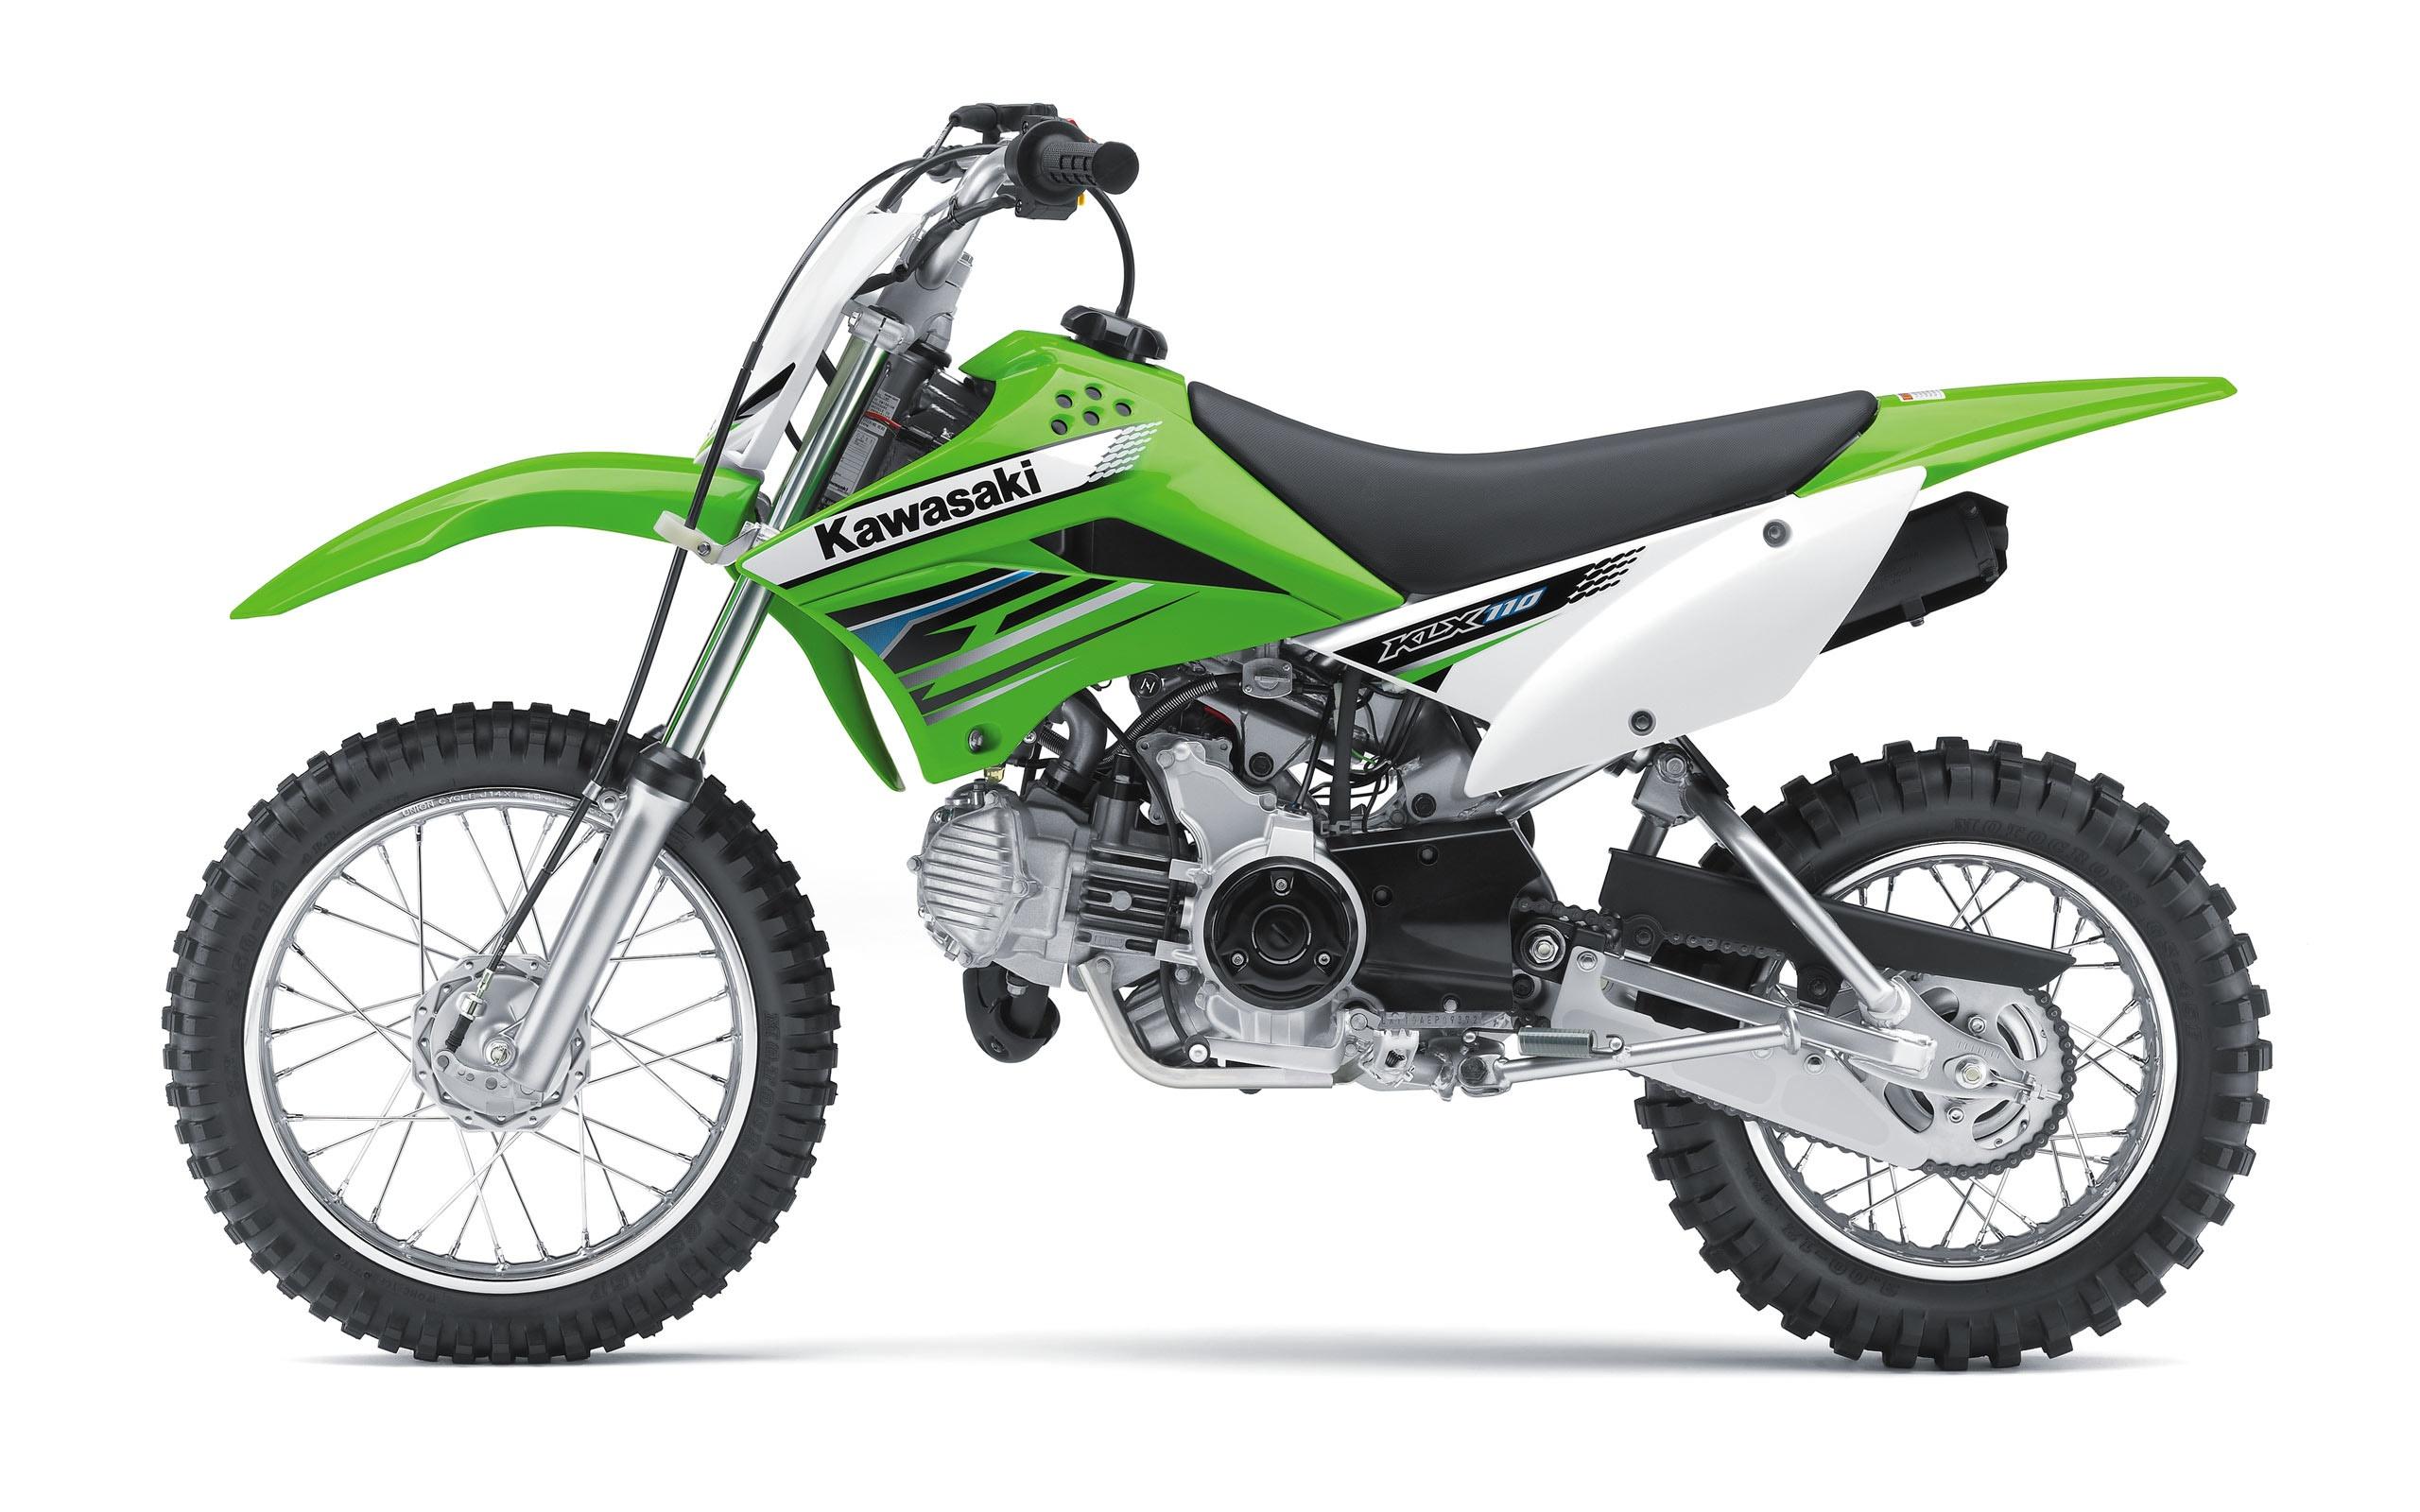 Wallpaper Kawasaki Motocross KLX110 2012 2560x1600 HD Picture Image